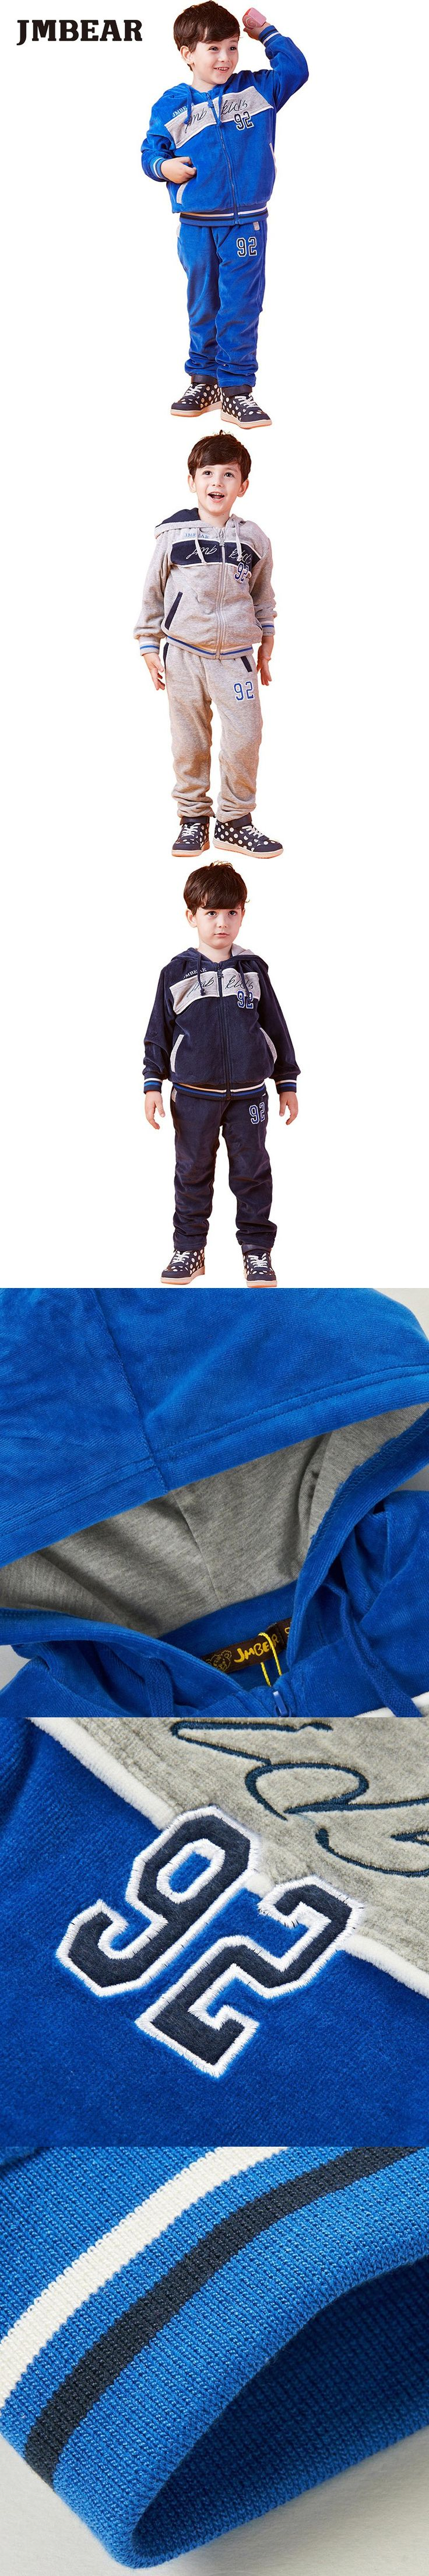 JMBEAR boys clothing set Baby Girls children brand tracksuit Suit hoodies+pants letter clothes set kids sportswear 3-14T